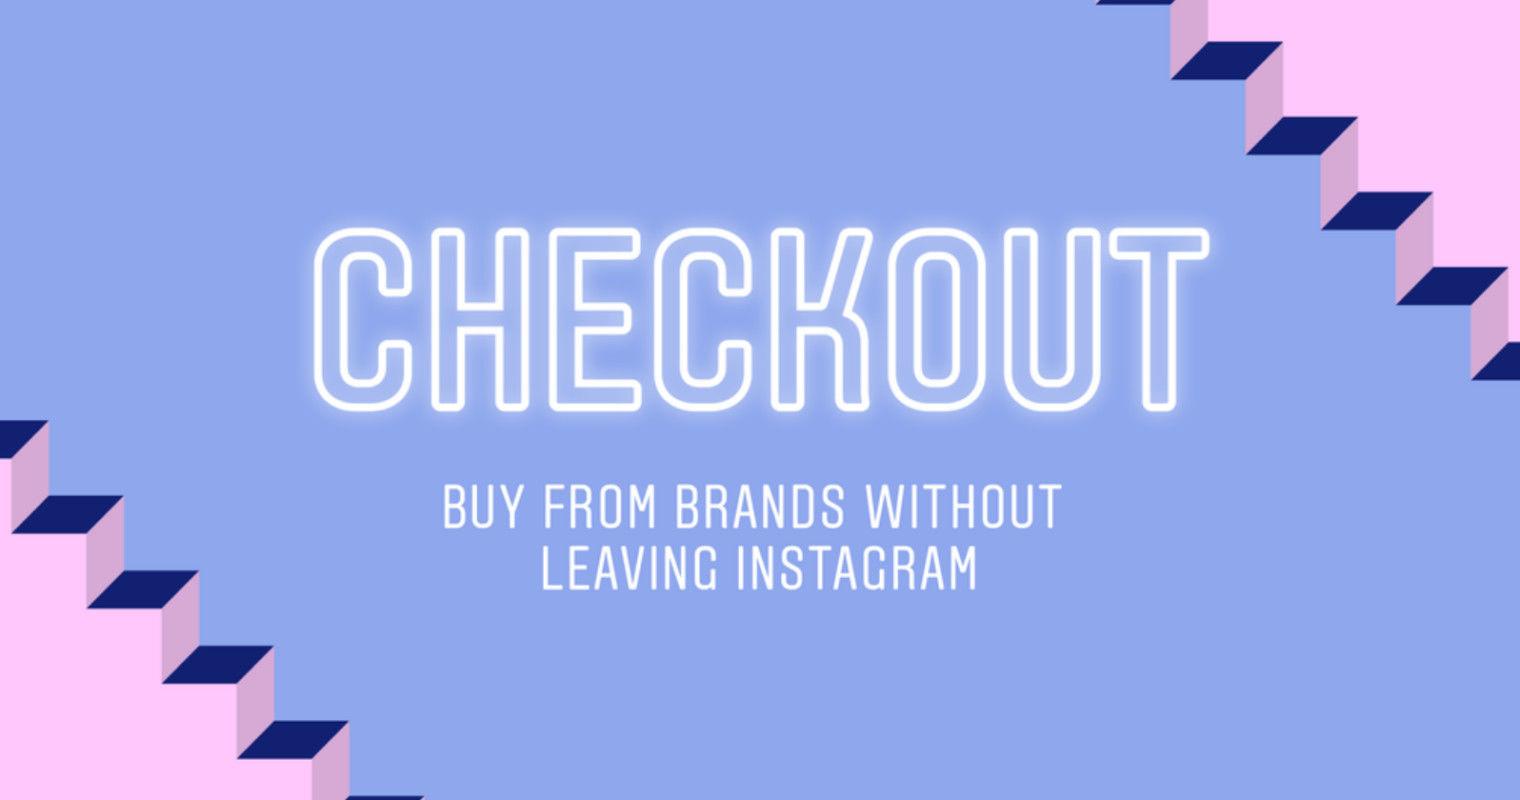 Instagram Q1推出線上購物功能checkout-鯊客科技SEO全網行銷公司